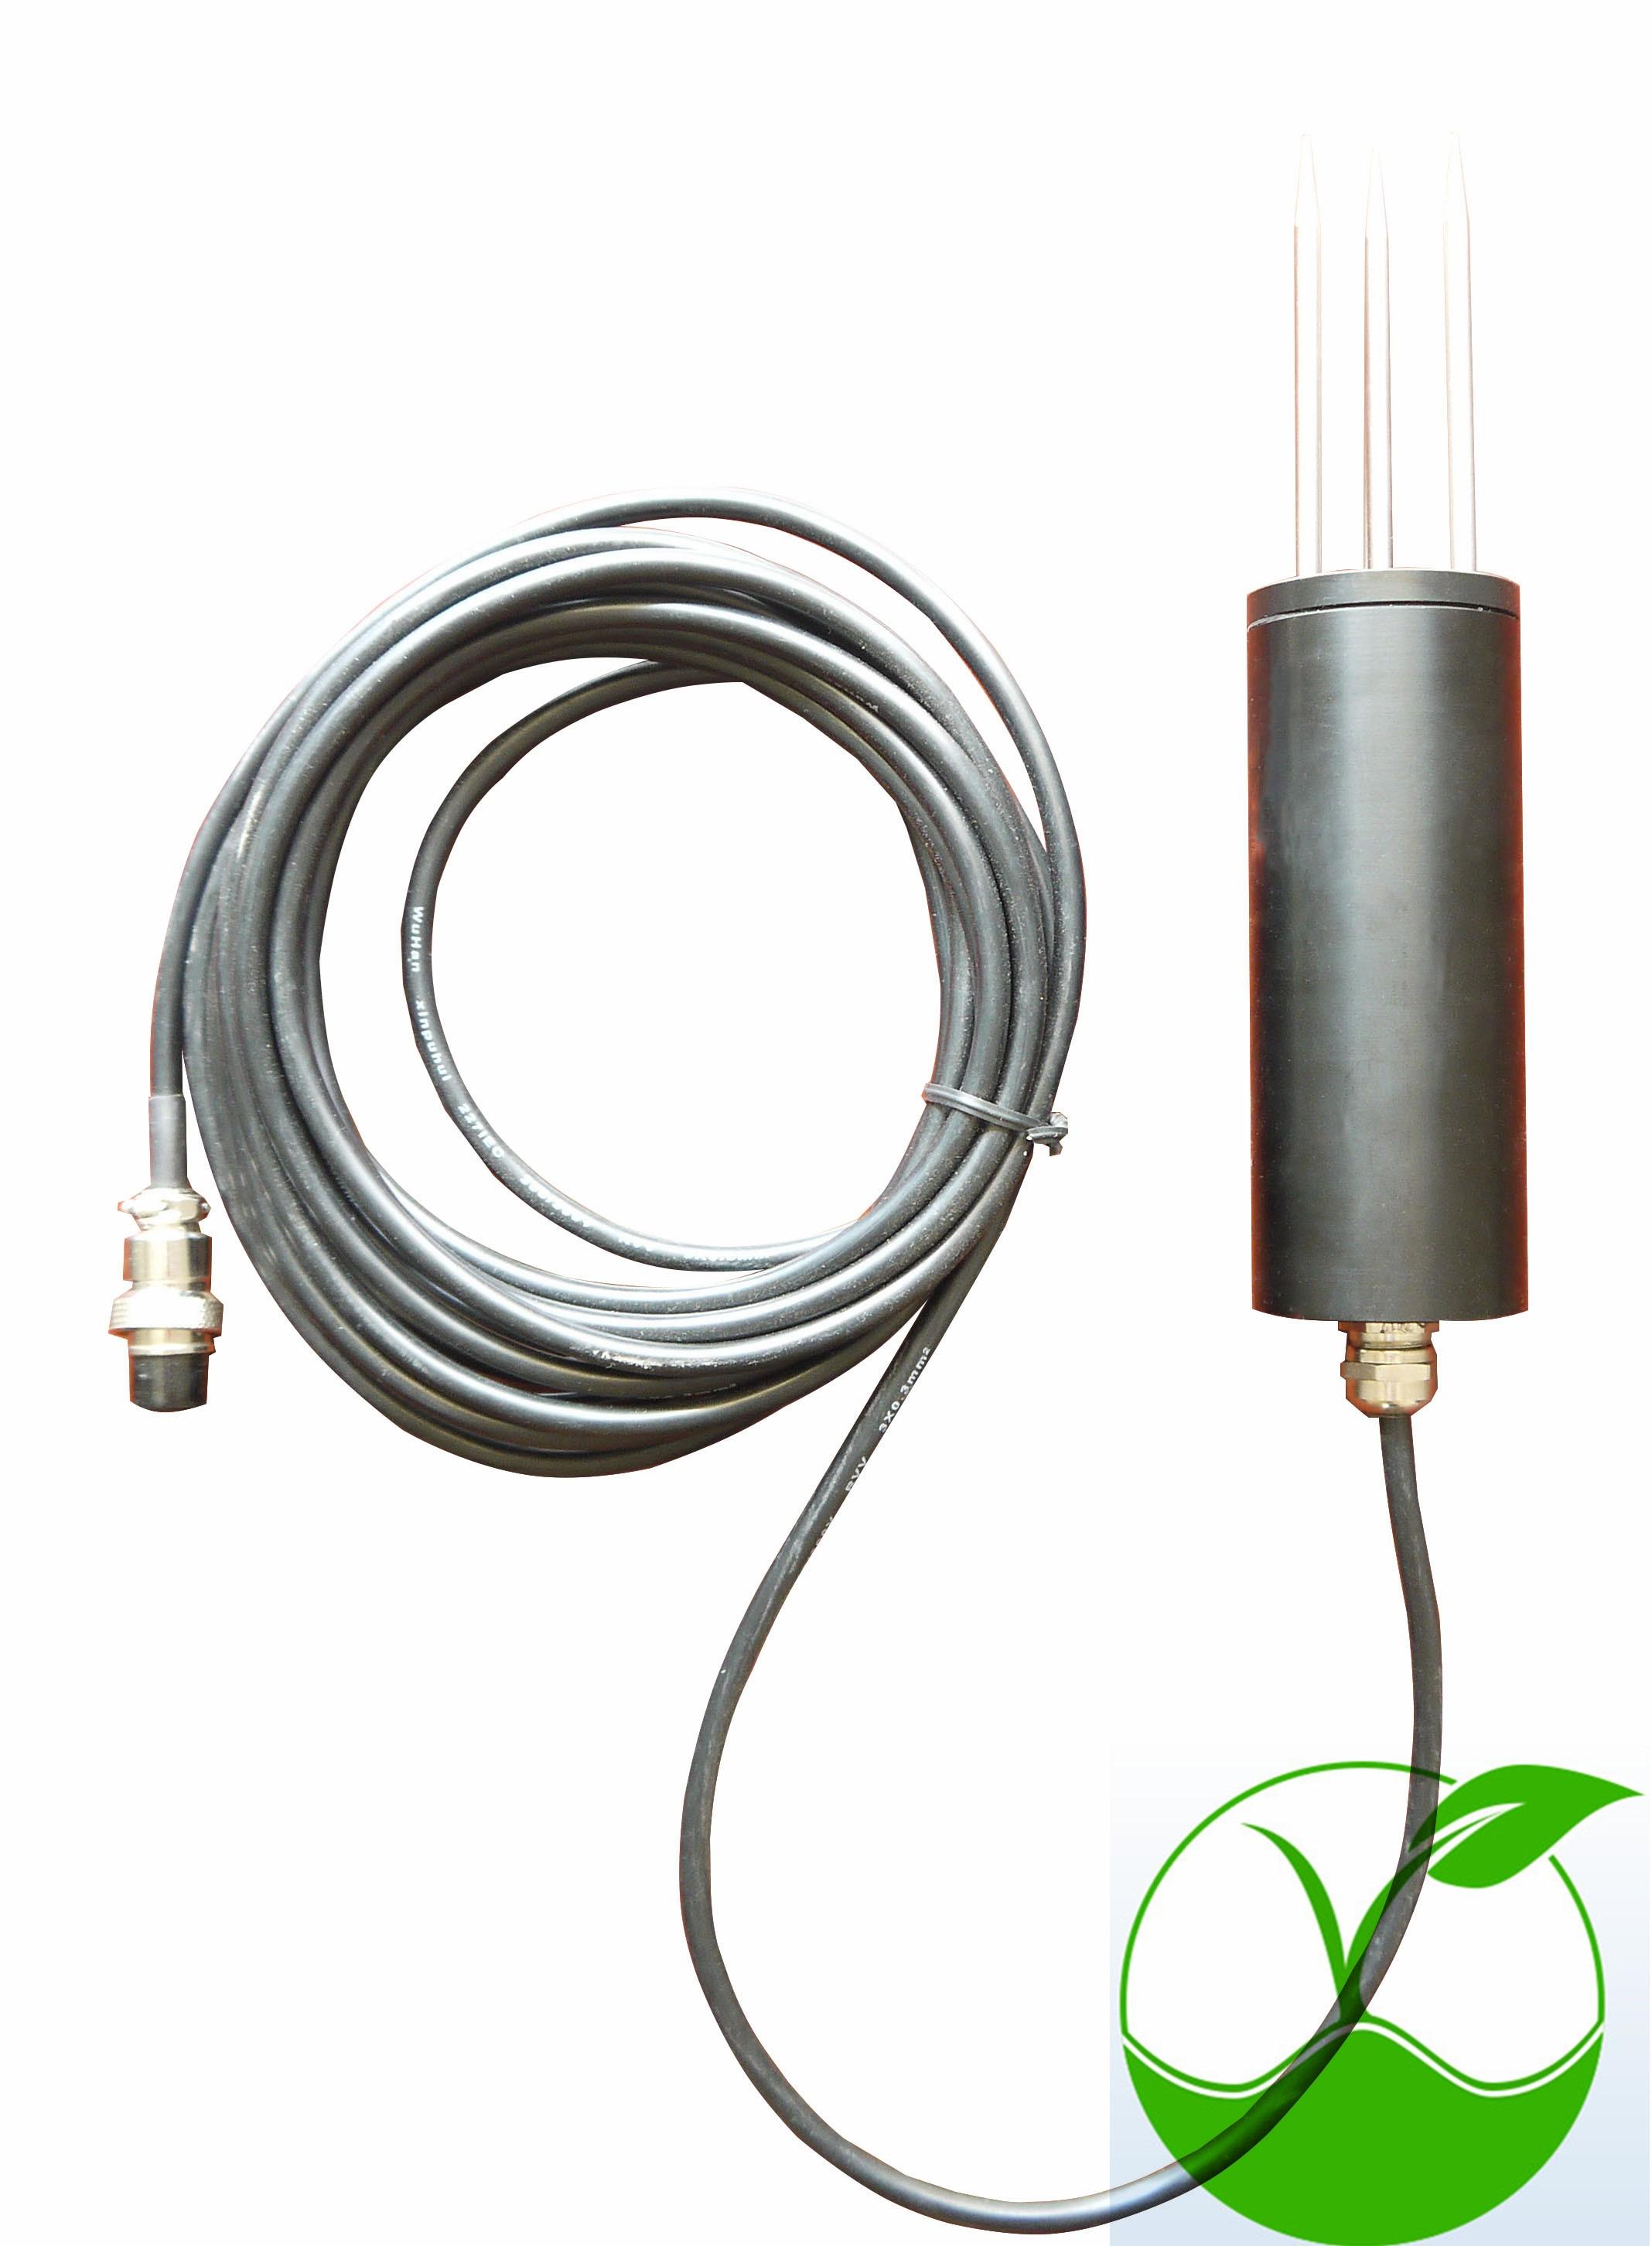 Soil moisture sensor / moisture content / moisture content (RS485 / 232,4-20mA / 0-2.5V)Soil moisture sensor / moisture content / moisture content (RS485 / 232,4-20mA / 0-2.5V)